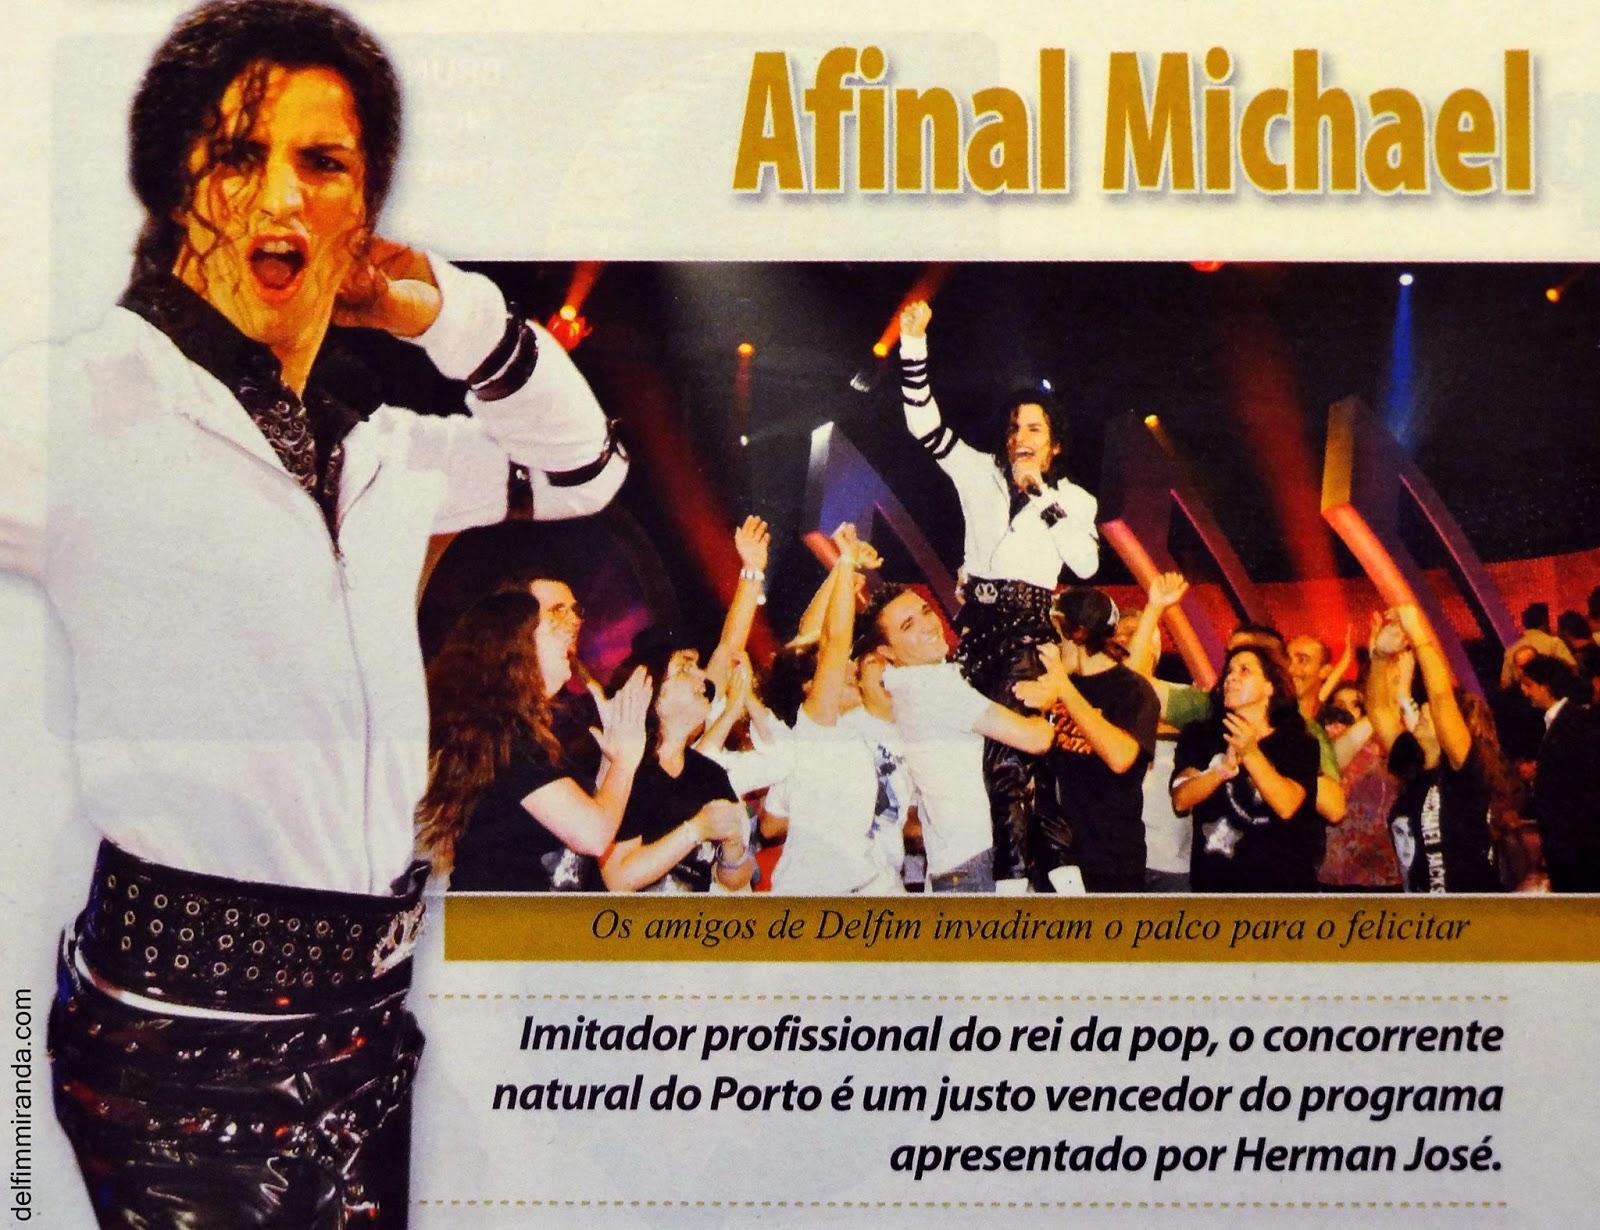 Delfim Miranda - Michael Jackson Tribute - Magazine cut - Winning the TV contest - The One & Only